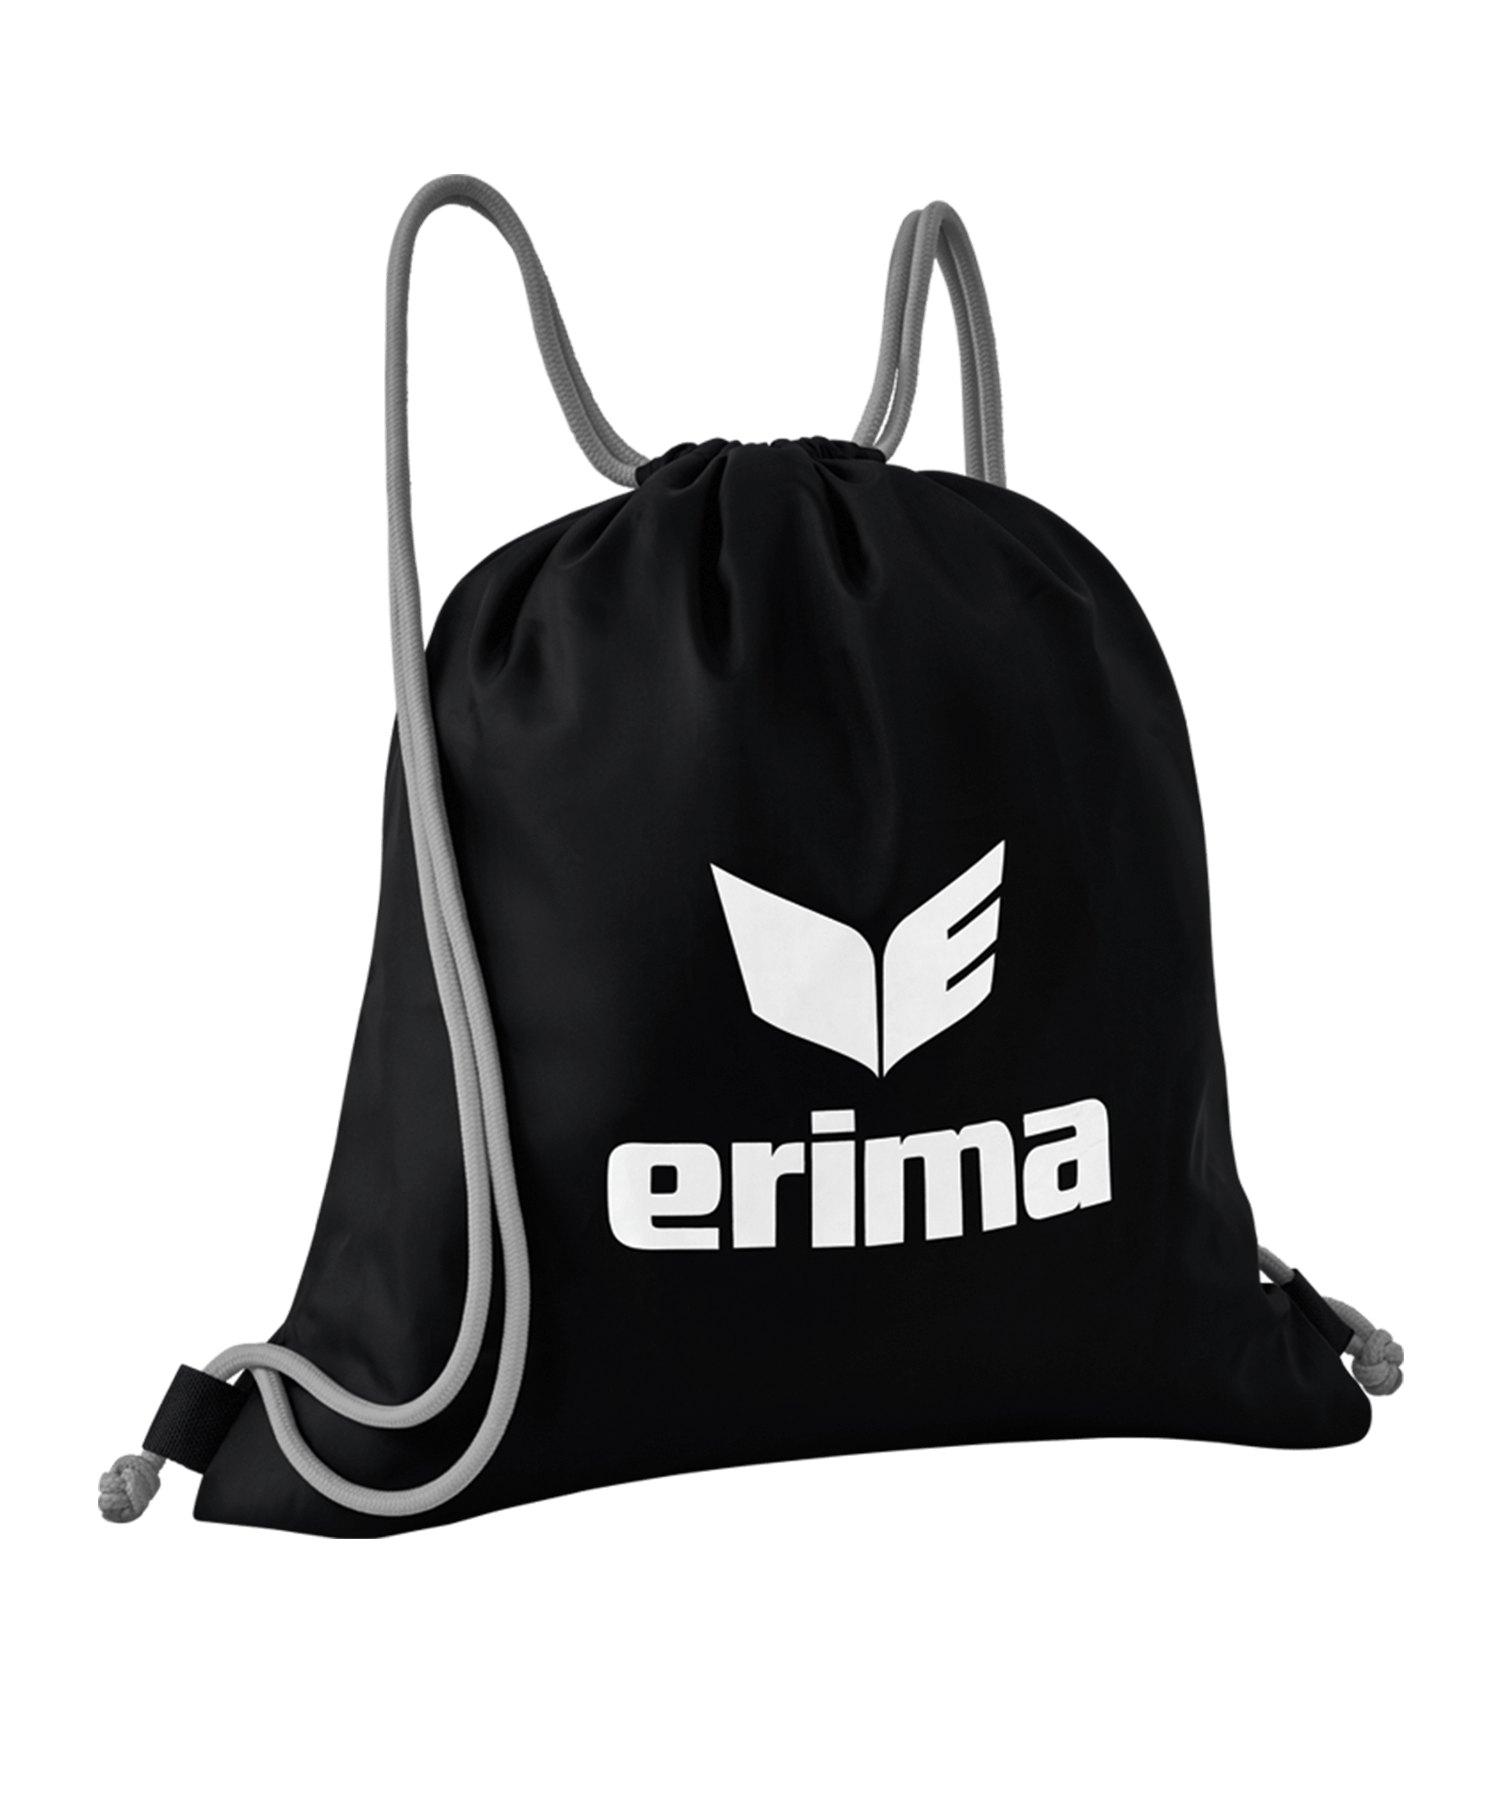 Erima Turnbeutel Pro Schwarz Grau - schwarz